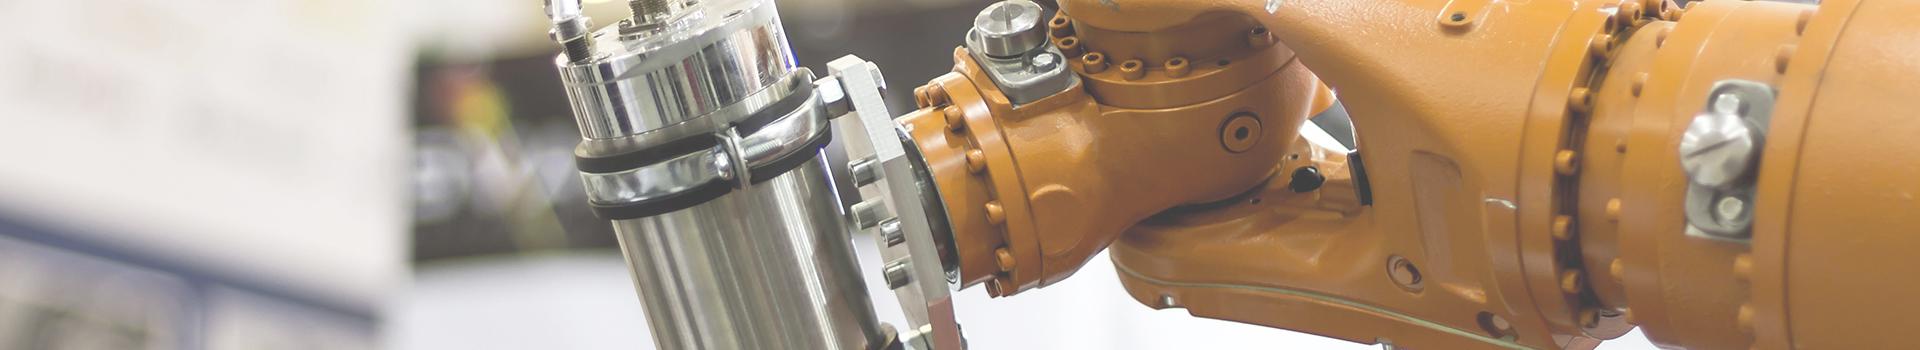 http://www.ameab.se/0986741_wp-uploads/2017/11/robotmaster_M.jpg